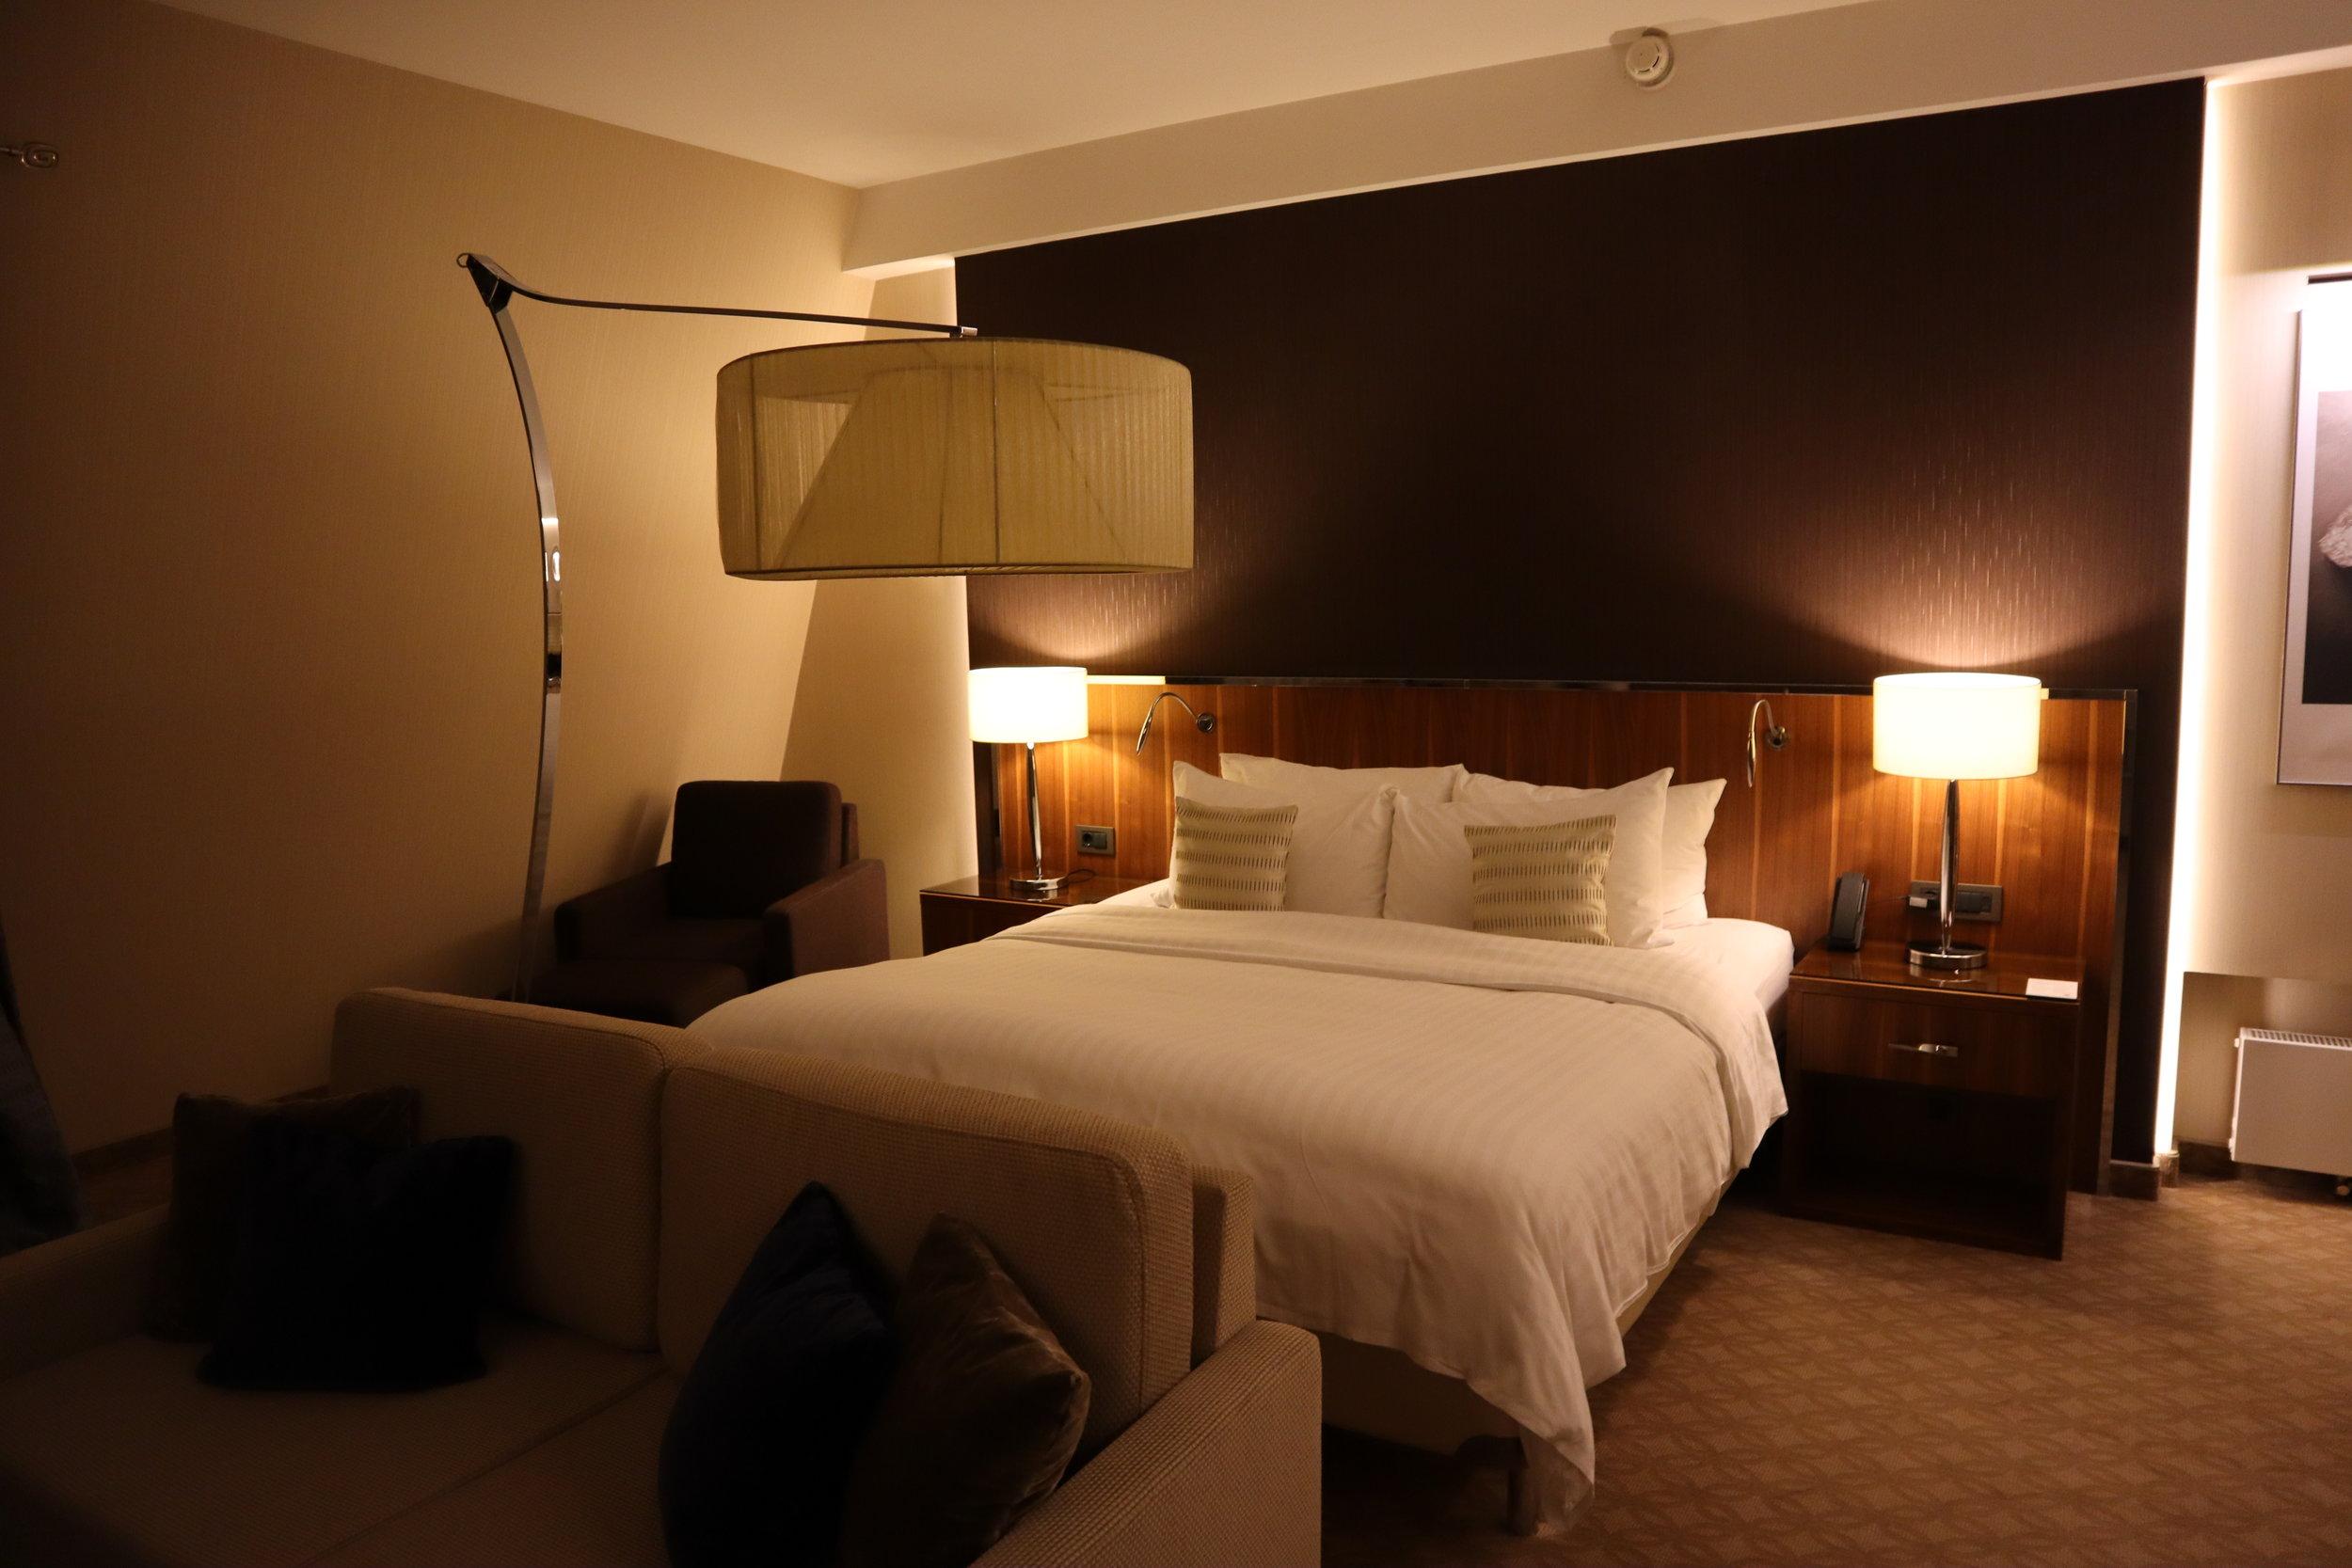 Junior suite at the  Marriott Novosibirsk